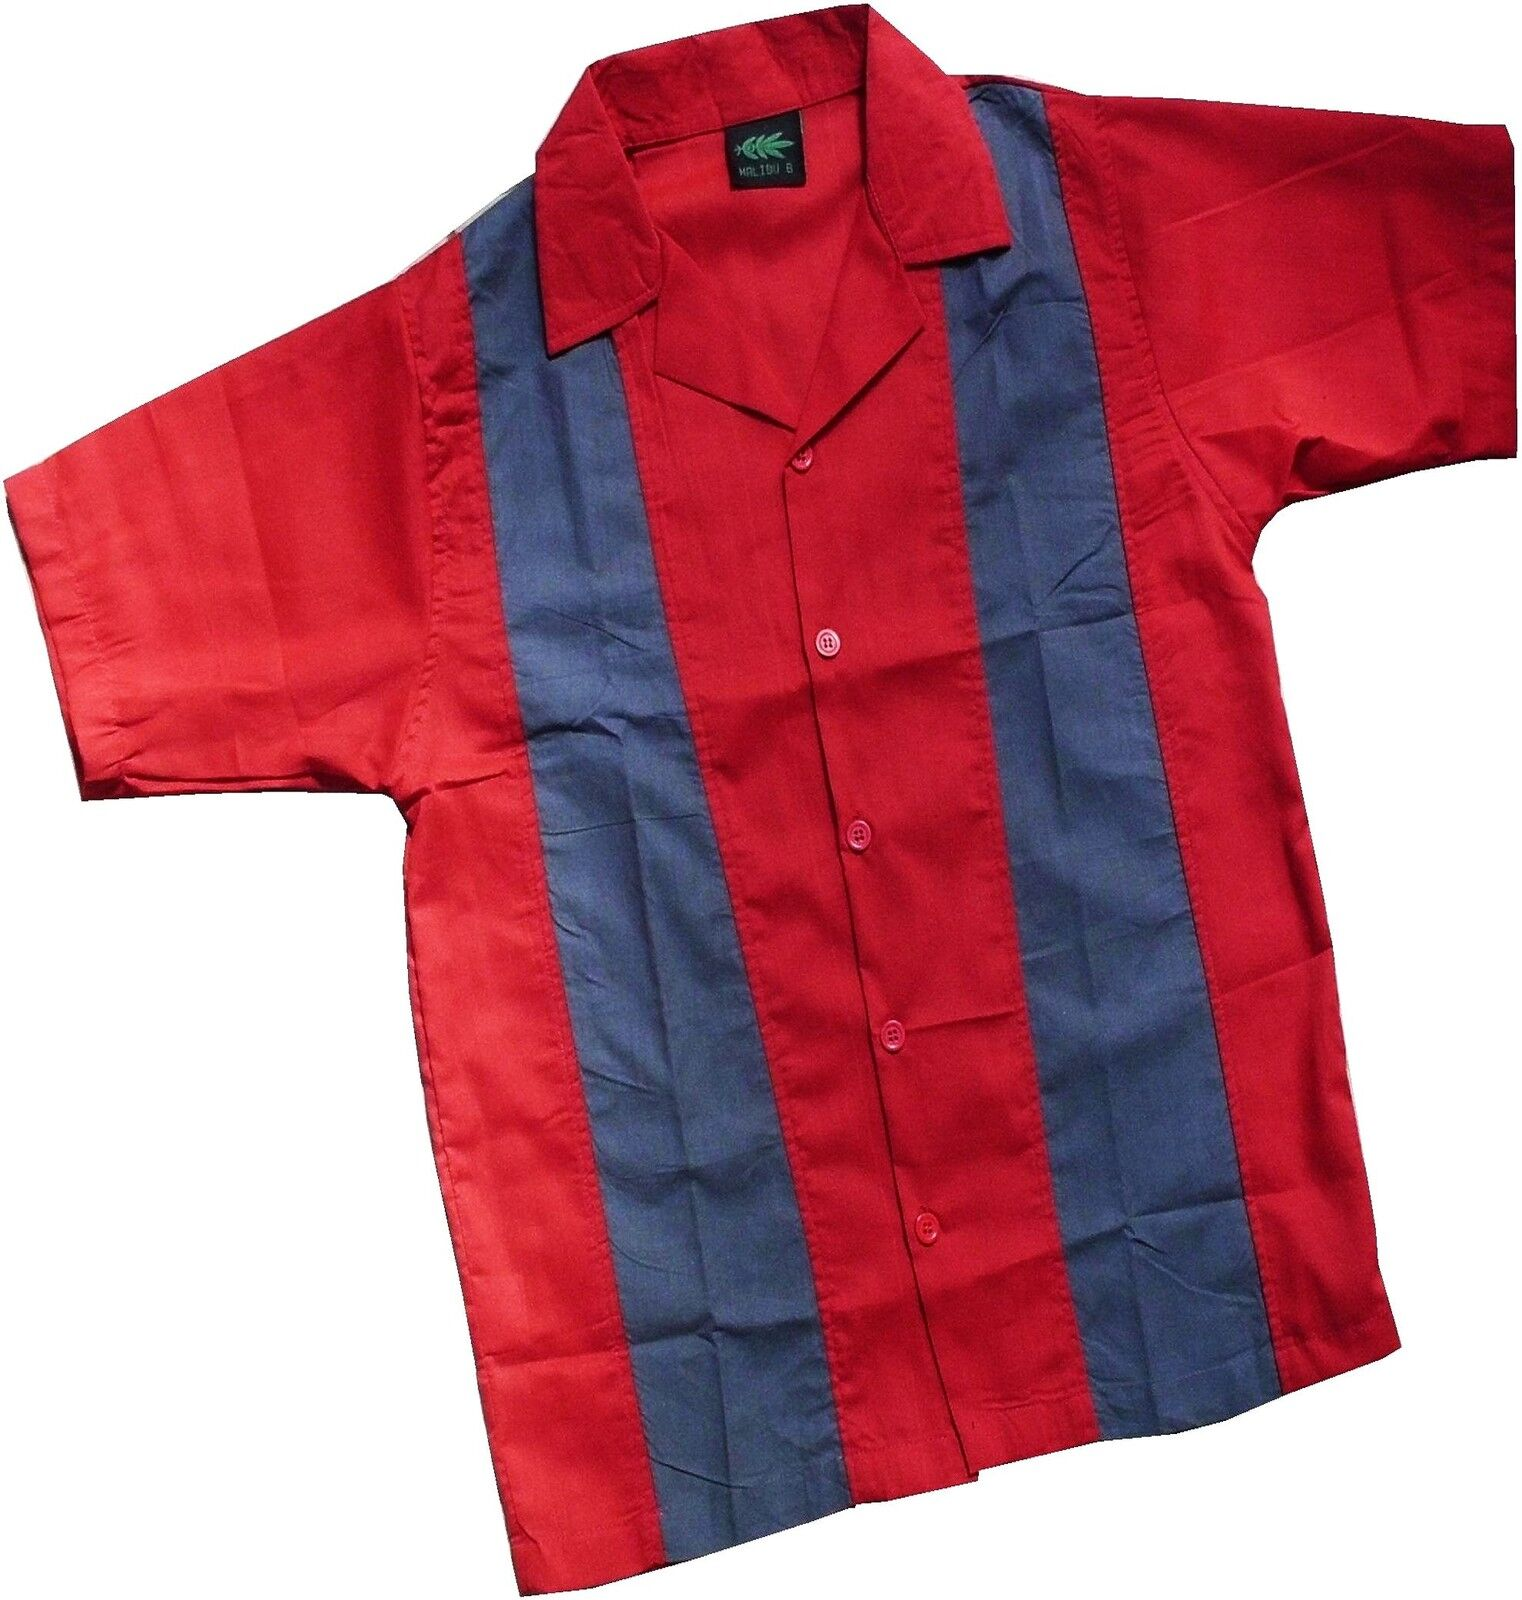 e82705066c3761 Bowling Hemd Shirt Charlie Harper   Sheen Style Sommerhemd 100 % BW M -  XXXL Neu